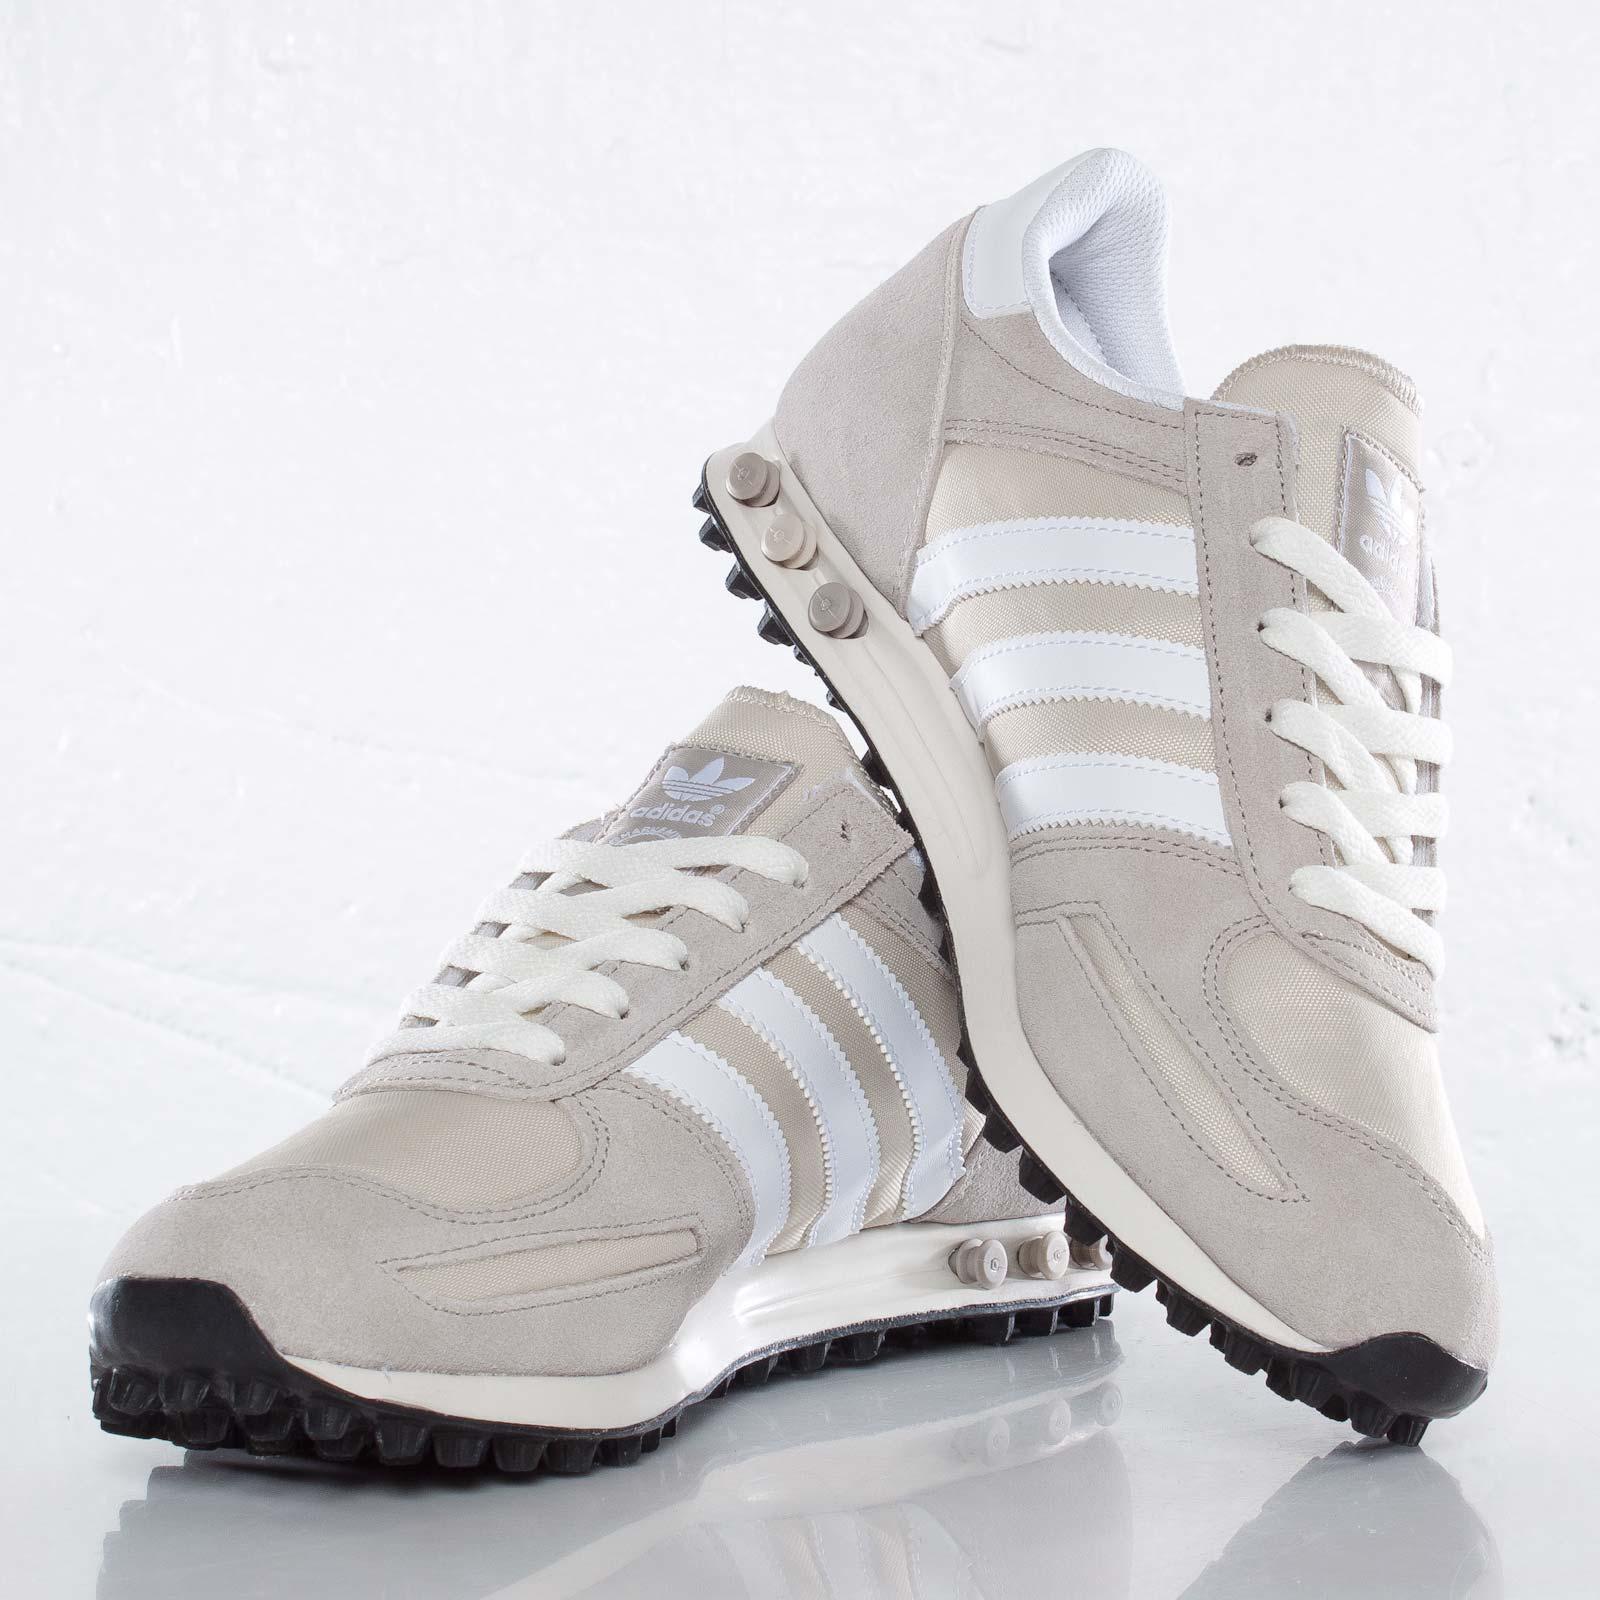 adidas LA Trainer - Q20743 - SNS   sneakers & streetwear online ...